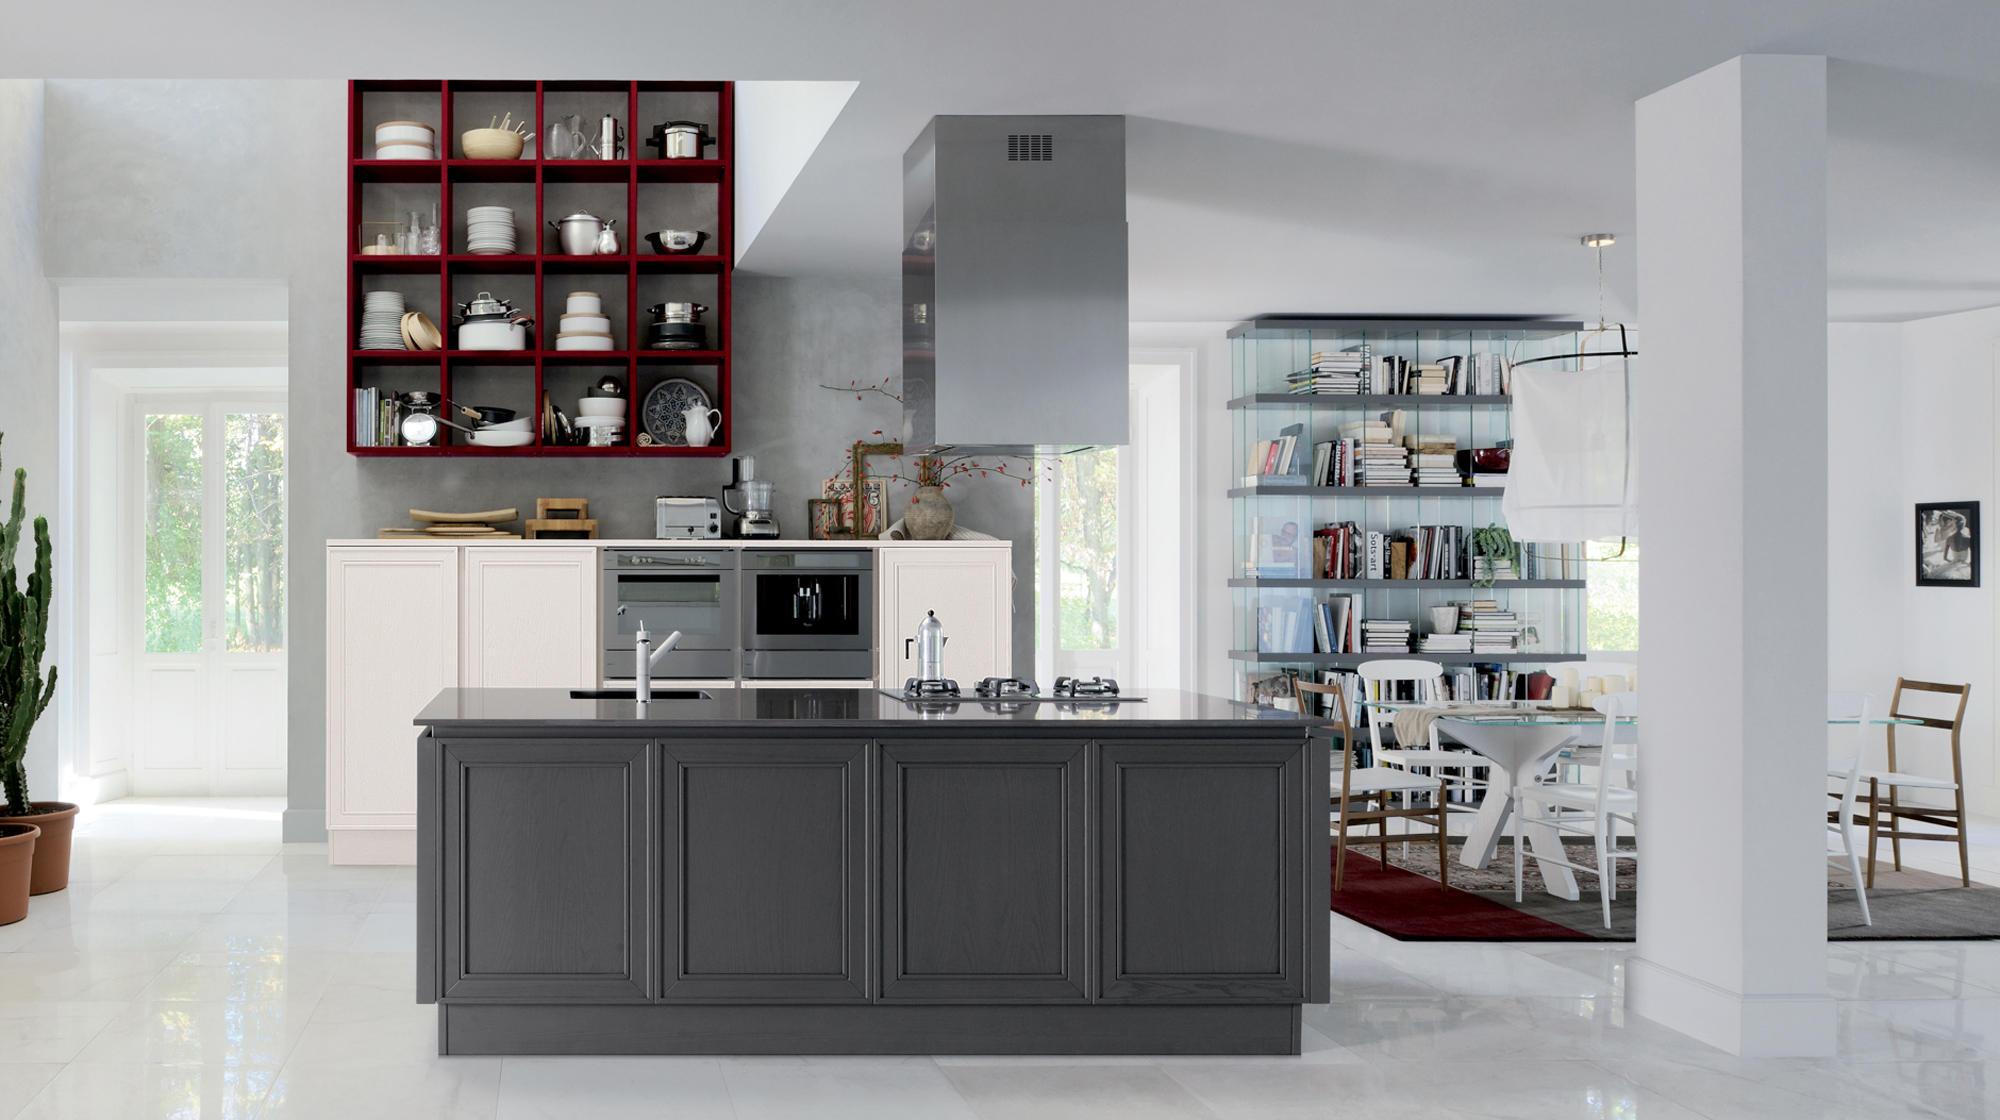 Veneta Cucine Elegante.Elegante Shellsystem Island Kitchens From Veneta Cucine